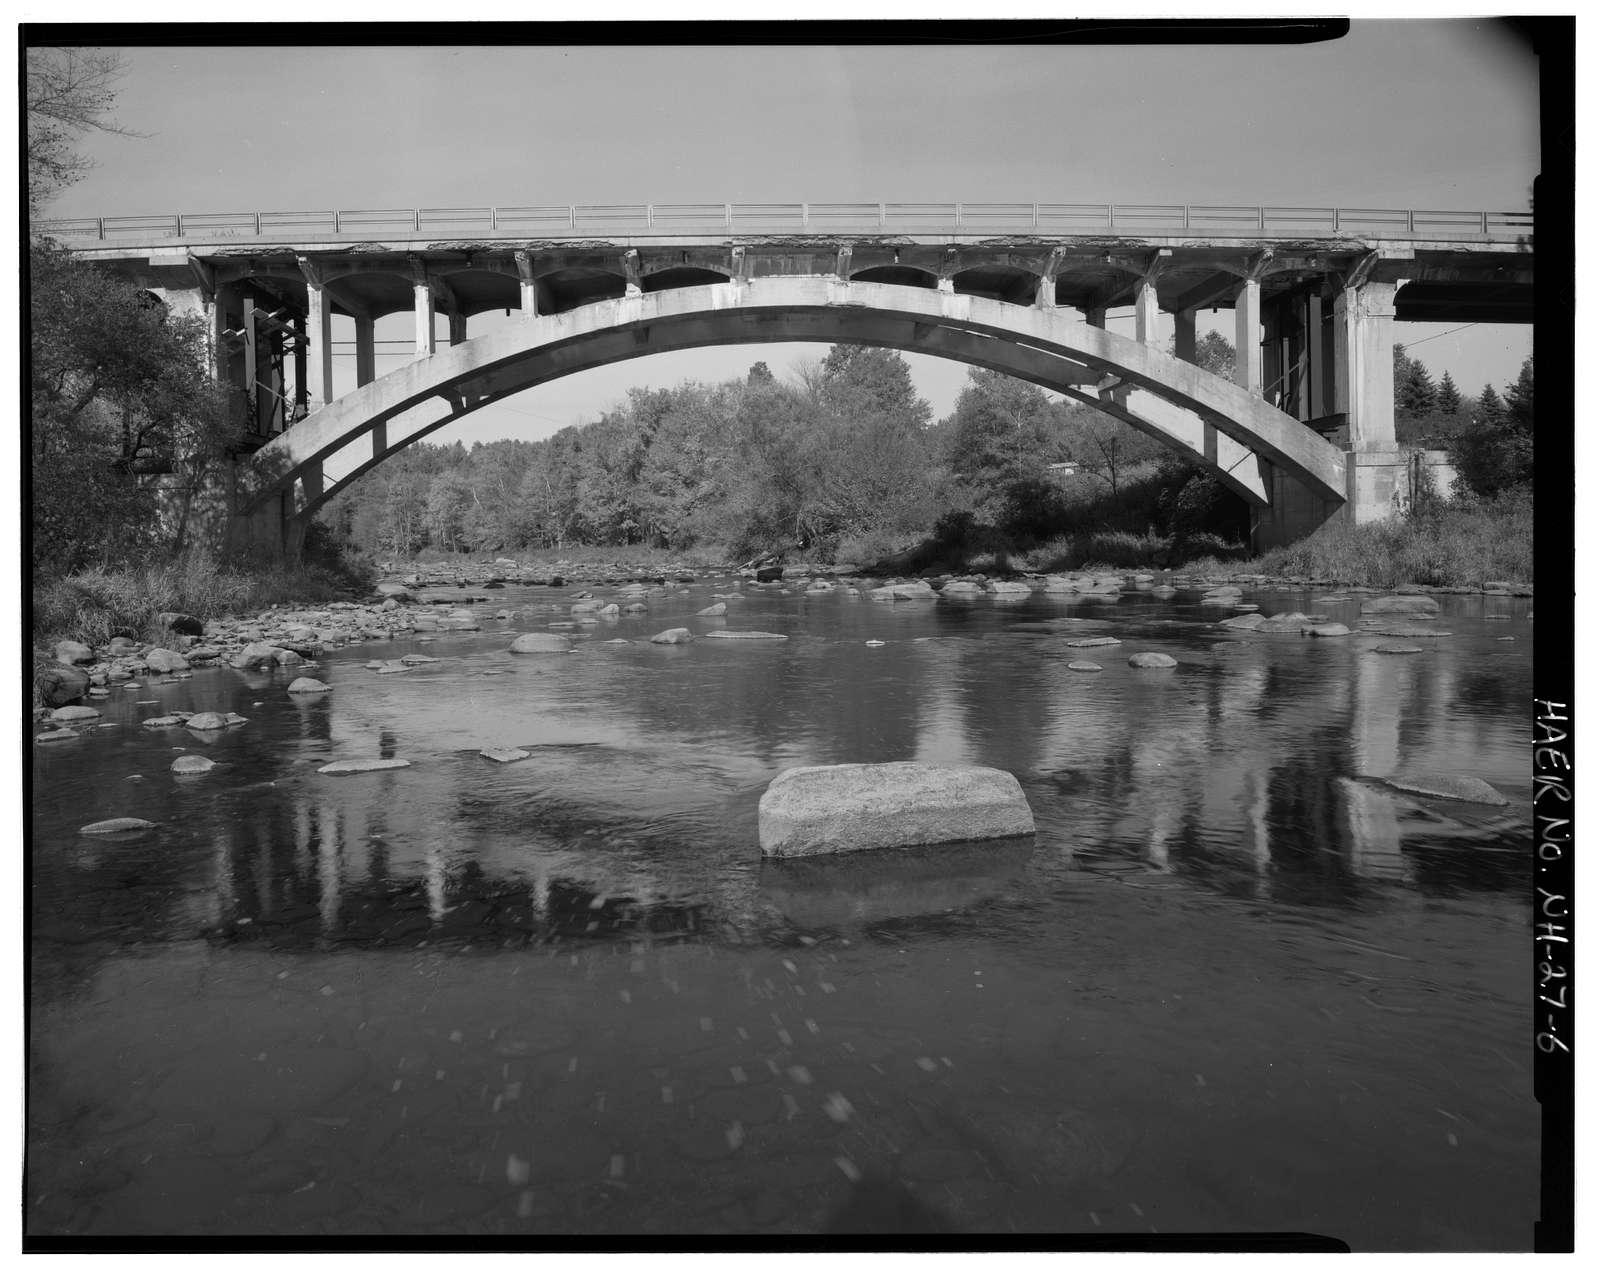 Kelleyville Bridge, Spanning Sugar River at State Route11/103, Newport, Sullivan County, NH